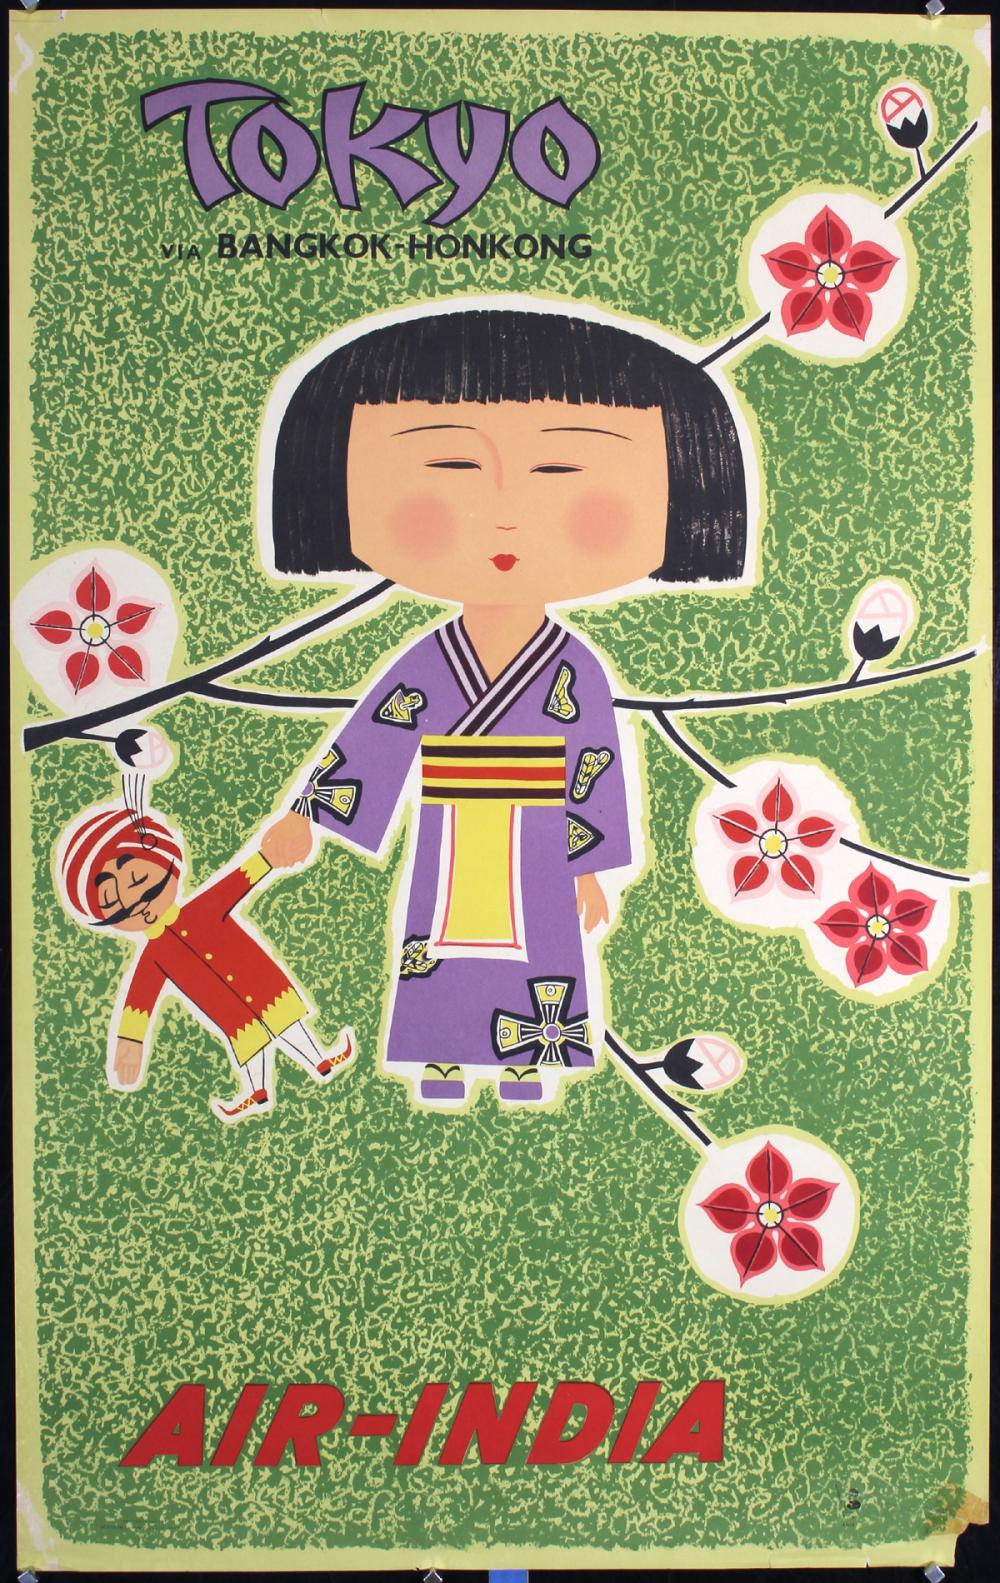 Original 1950s/60s Air India Tokyo Travel Poster